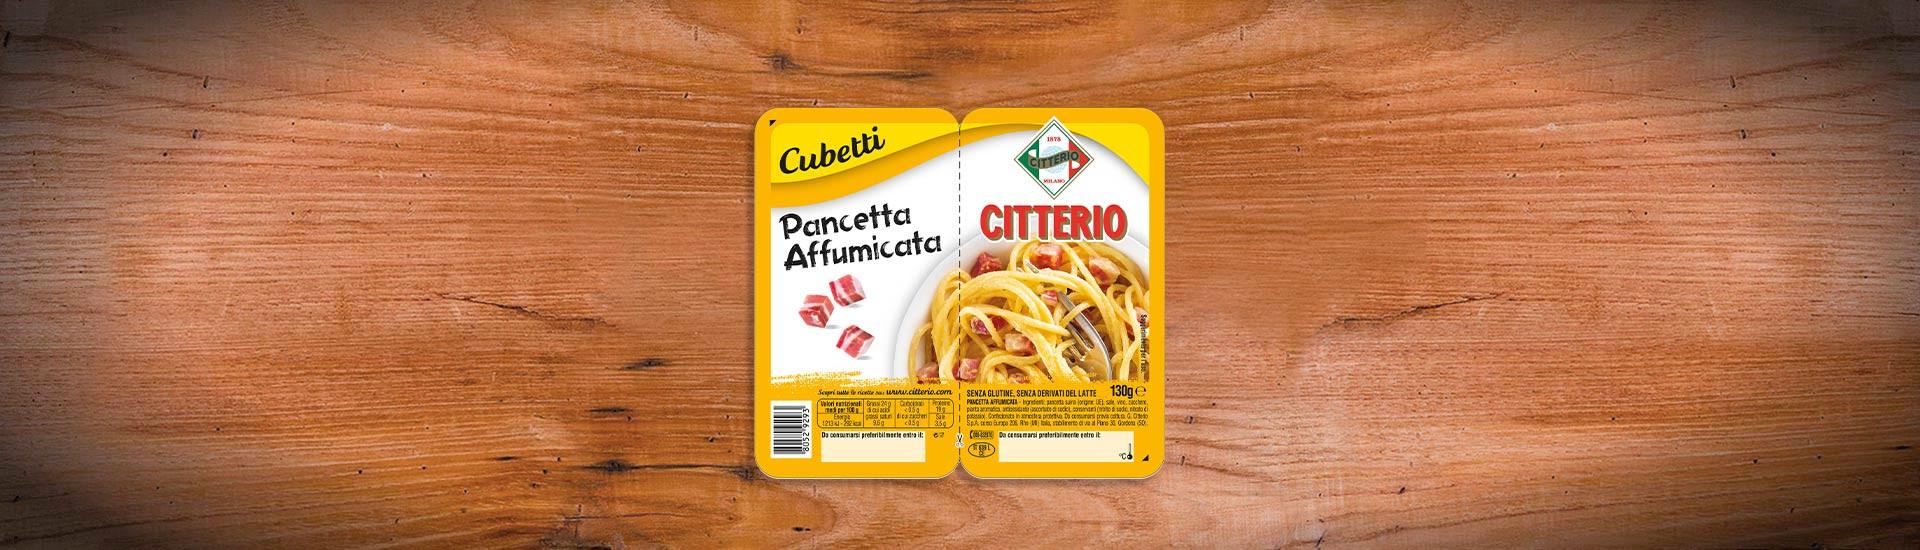 Pancetta Affumicata Citterio Cubetti